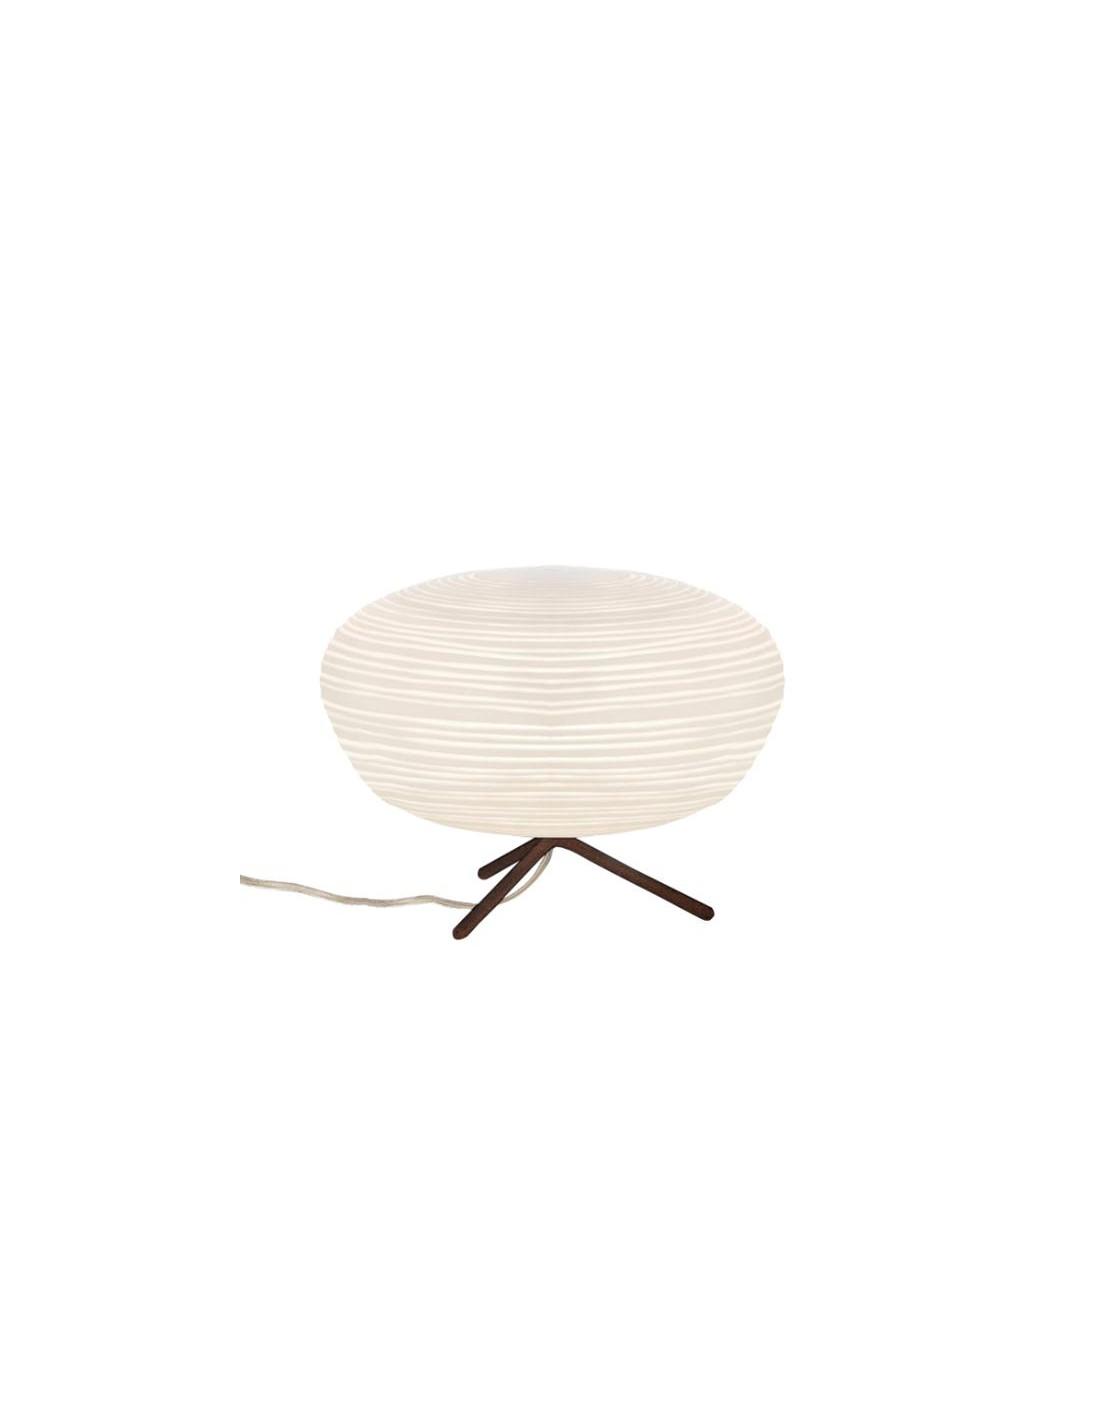 Lampe de table Rituals 2 foscarini